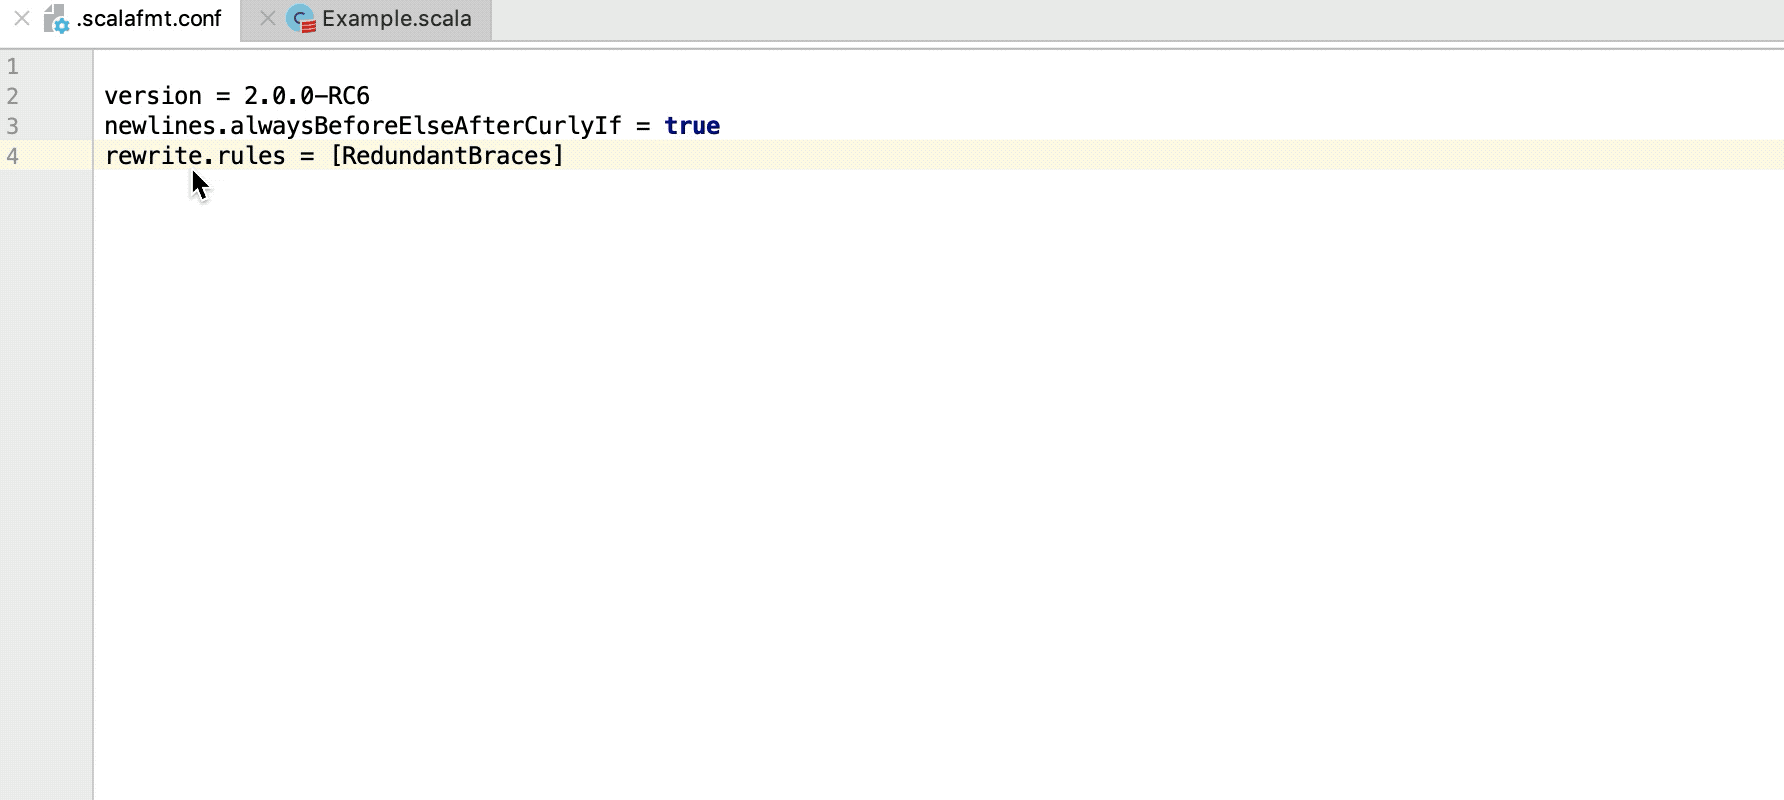 Reformat Scala code